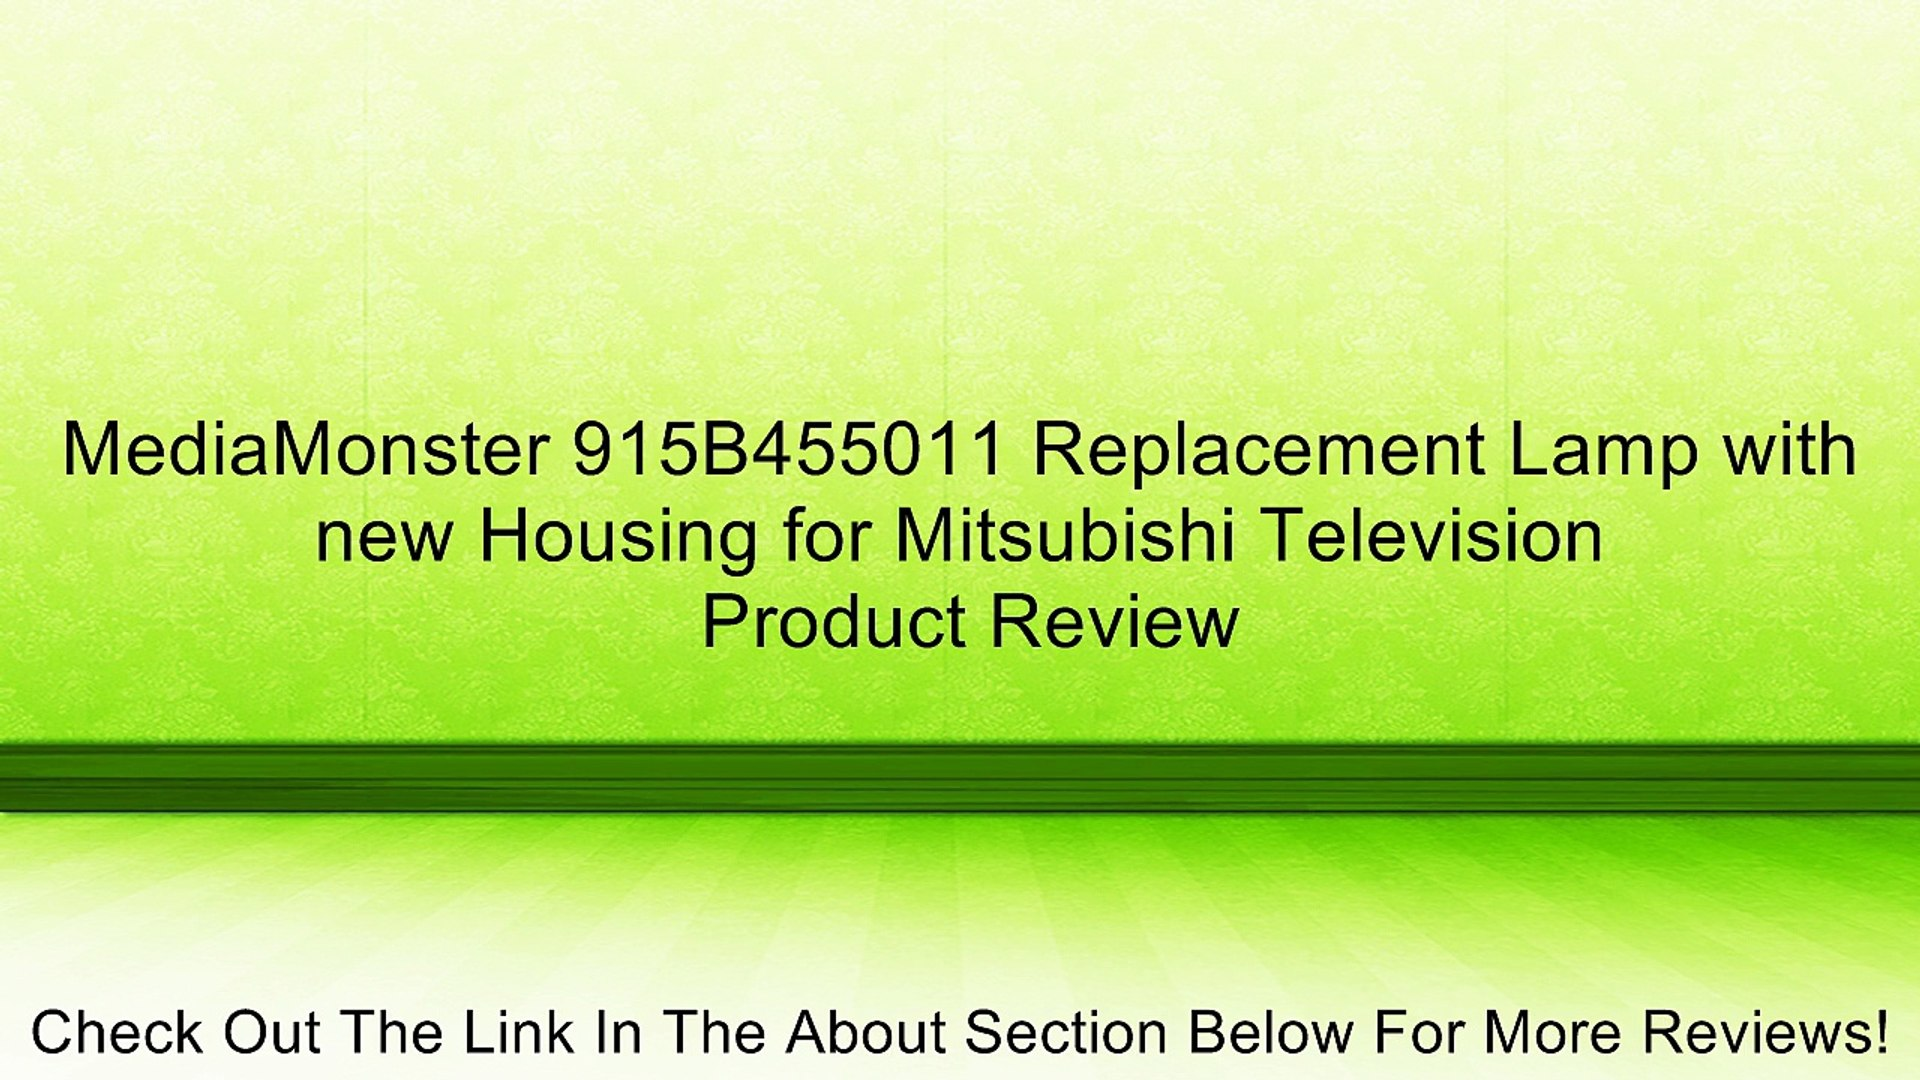 WD-73740 WD73740 915B455011 Philips Original Mitsubishi DLP Projection TV Lamp